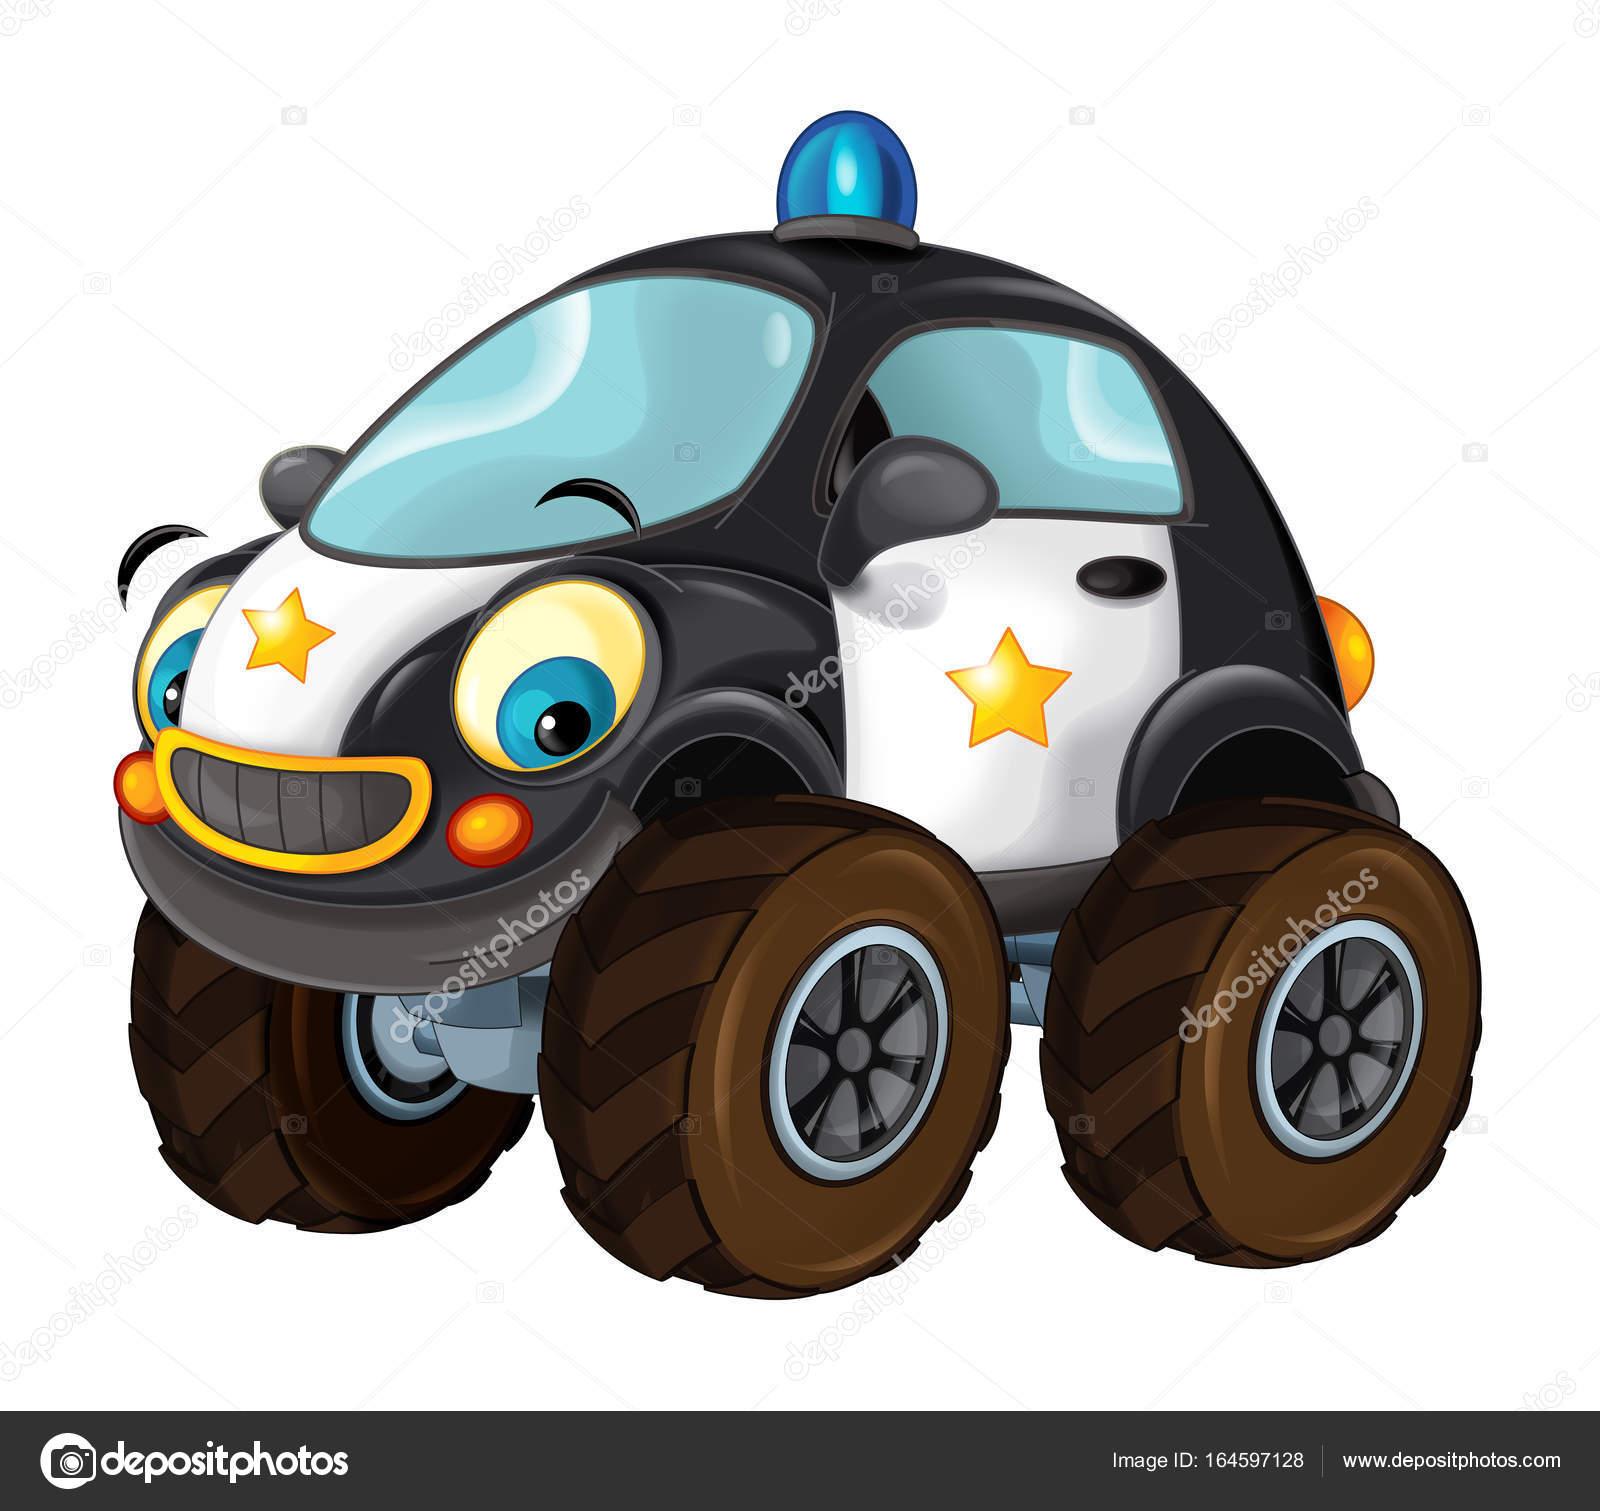 Dessin anim au large de la voiture de police route photographie illustrator hft 164597128 - Voiture police dessin anime ...